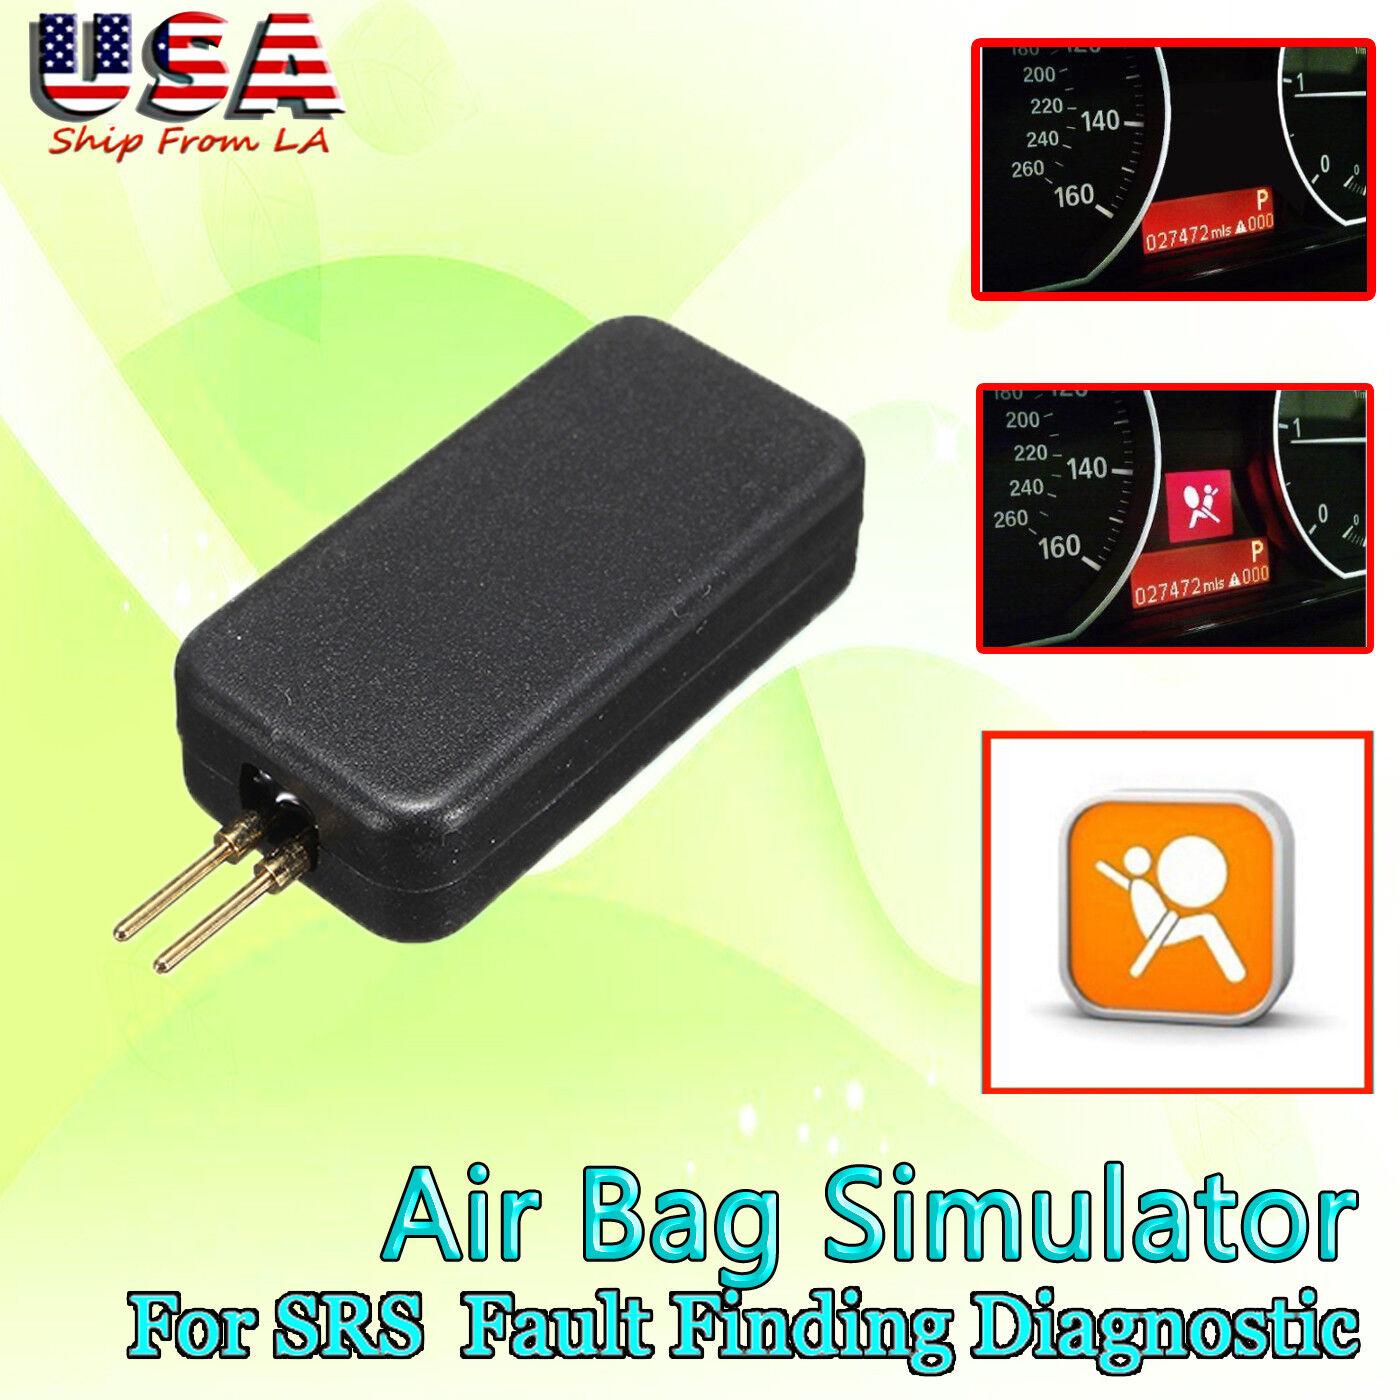 Car SRS Airbag Simulator Emulator Resistor Bypass Fault Finding Diagnostic 5x LS